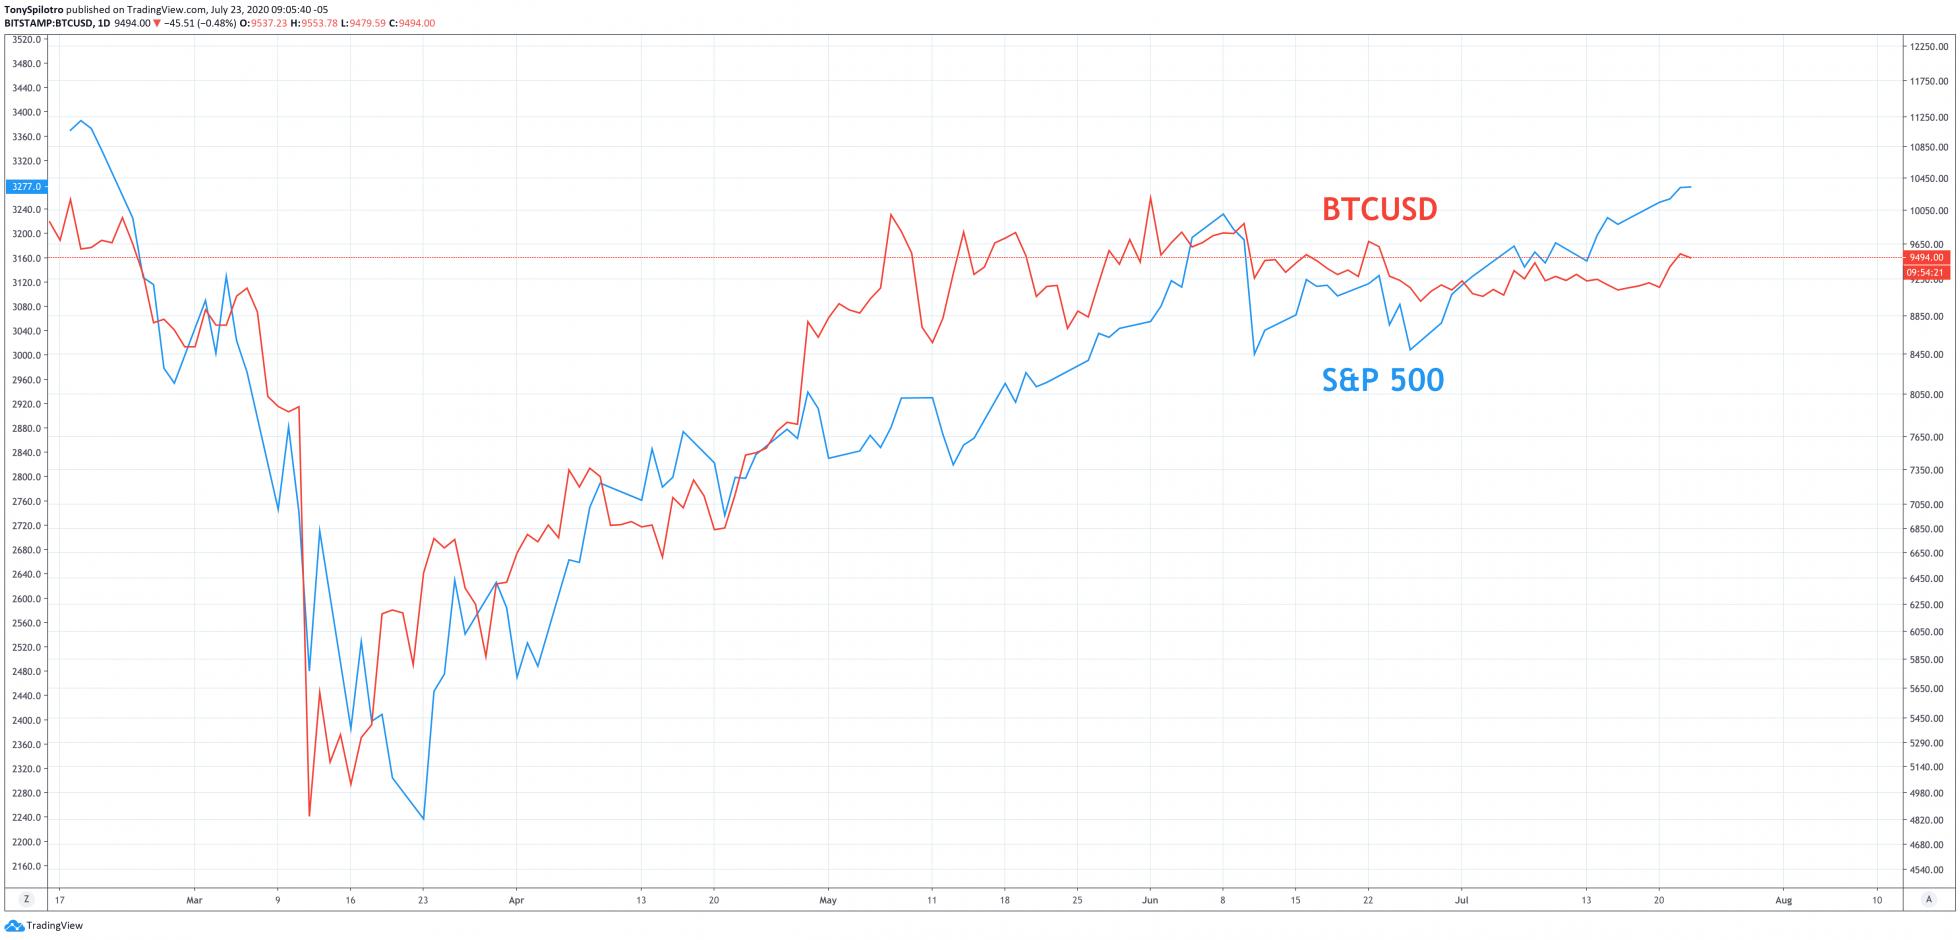 bitcoin sp500 spx stock market